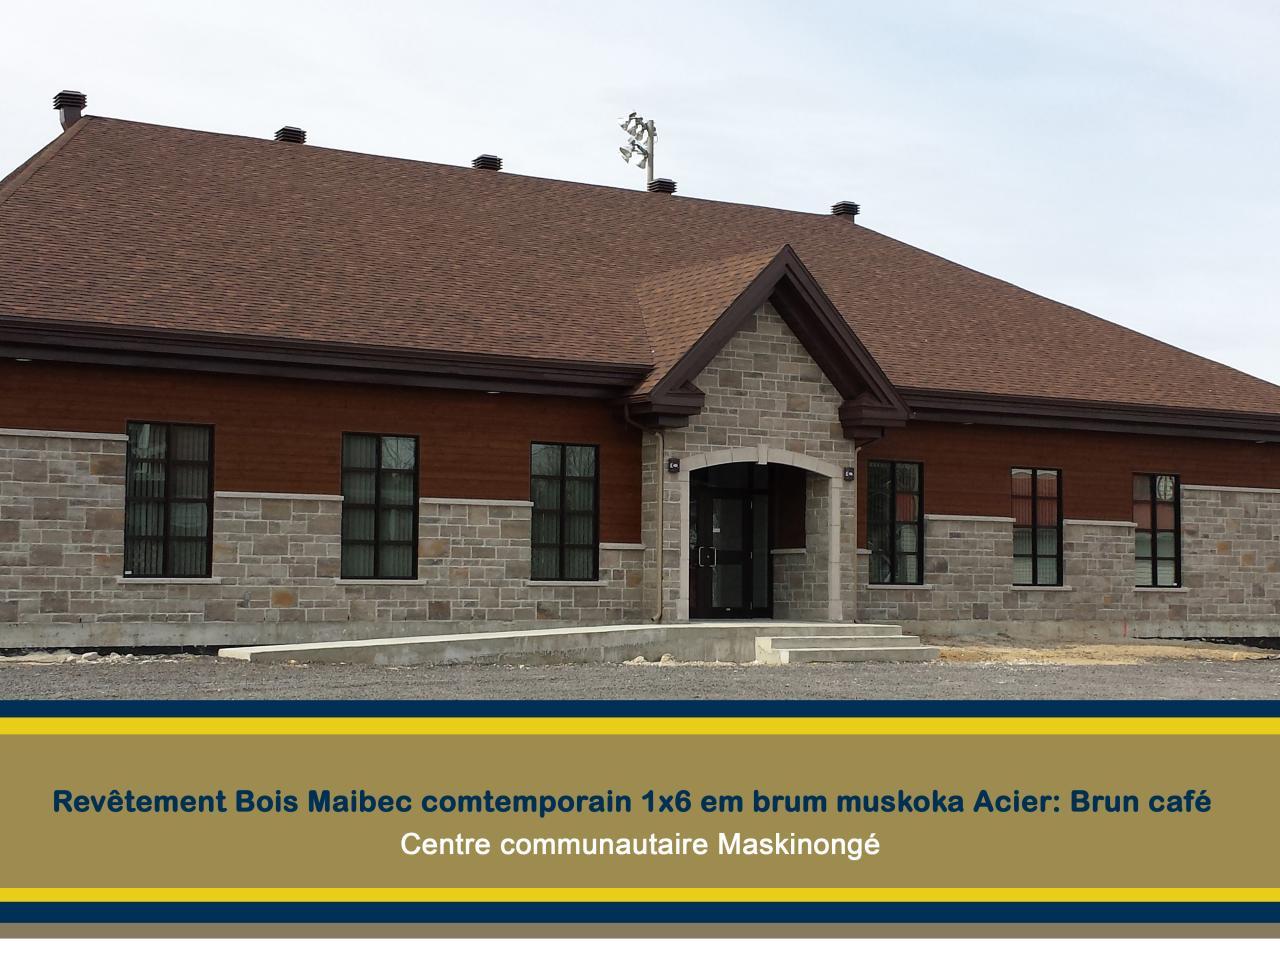 Centre communautaire Maskinongé